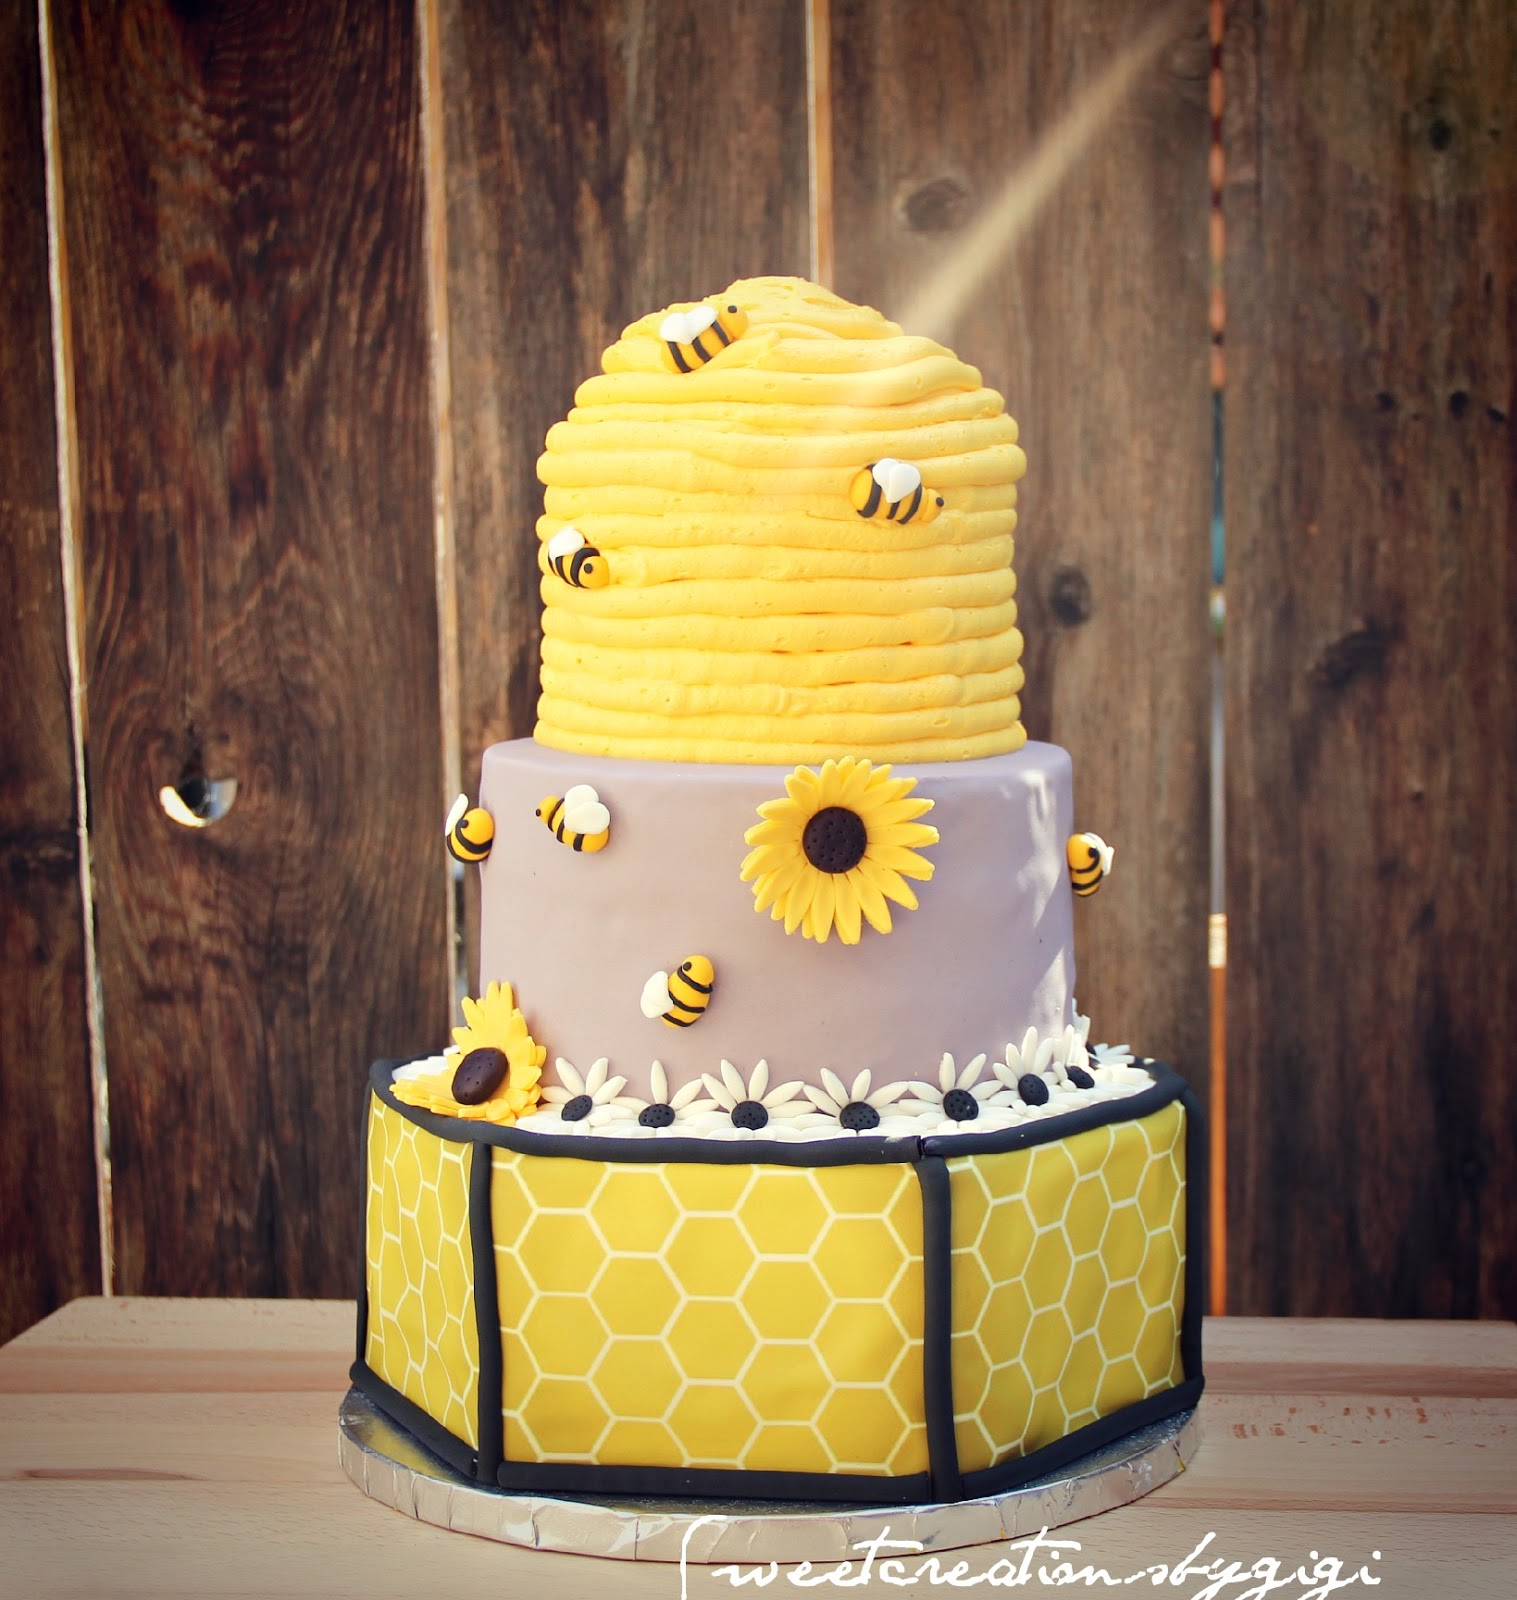 Wedding Cakes | Sweet Creations by Gigi